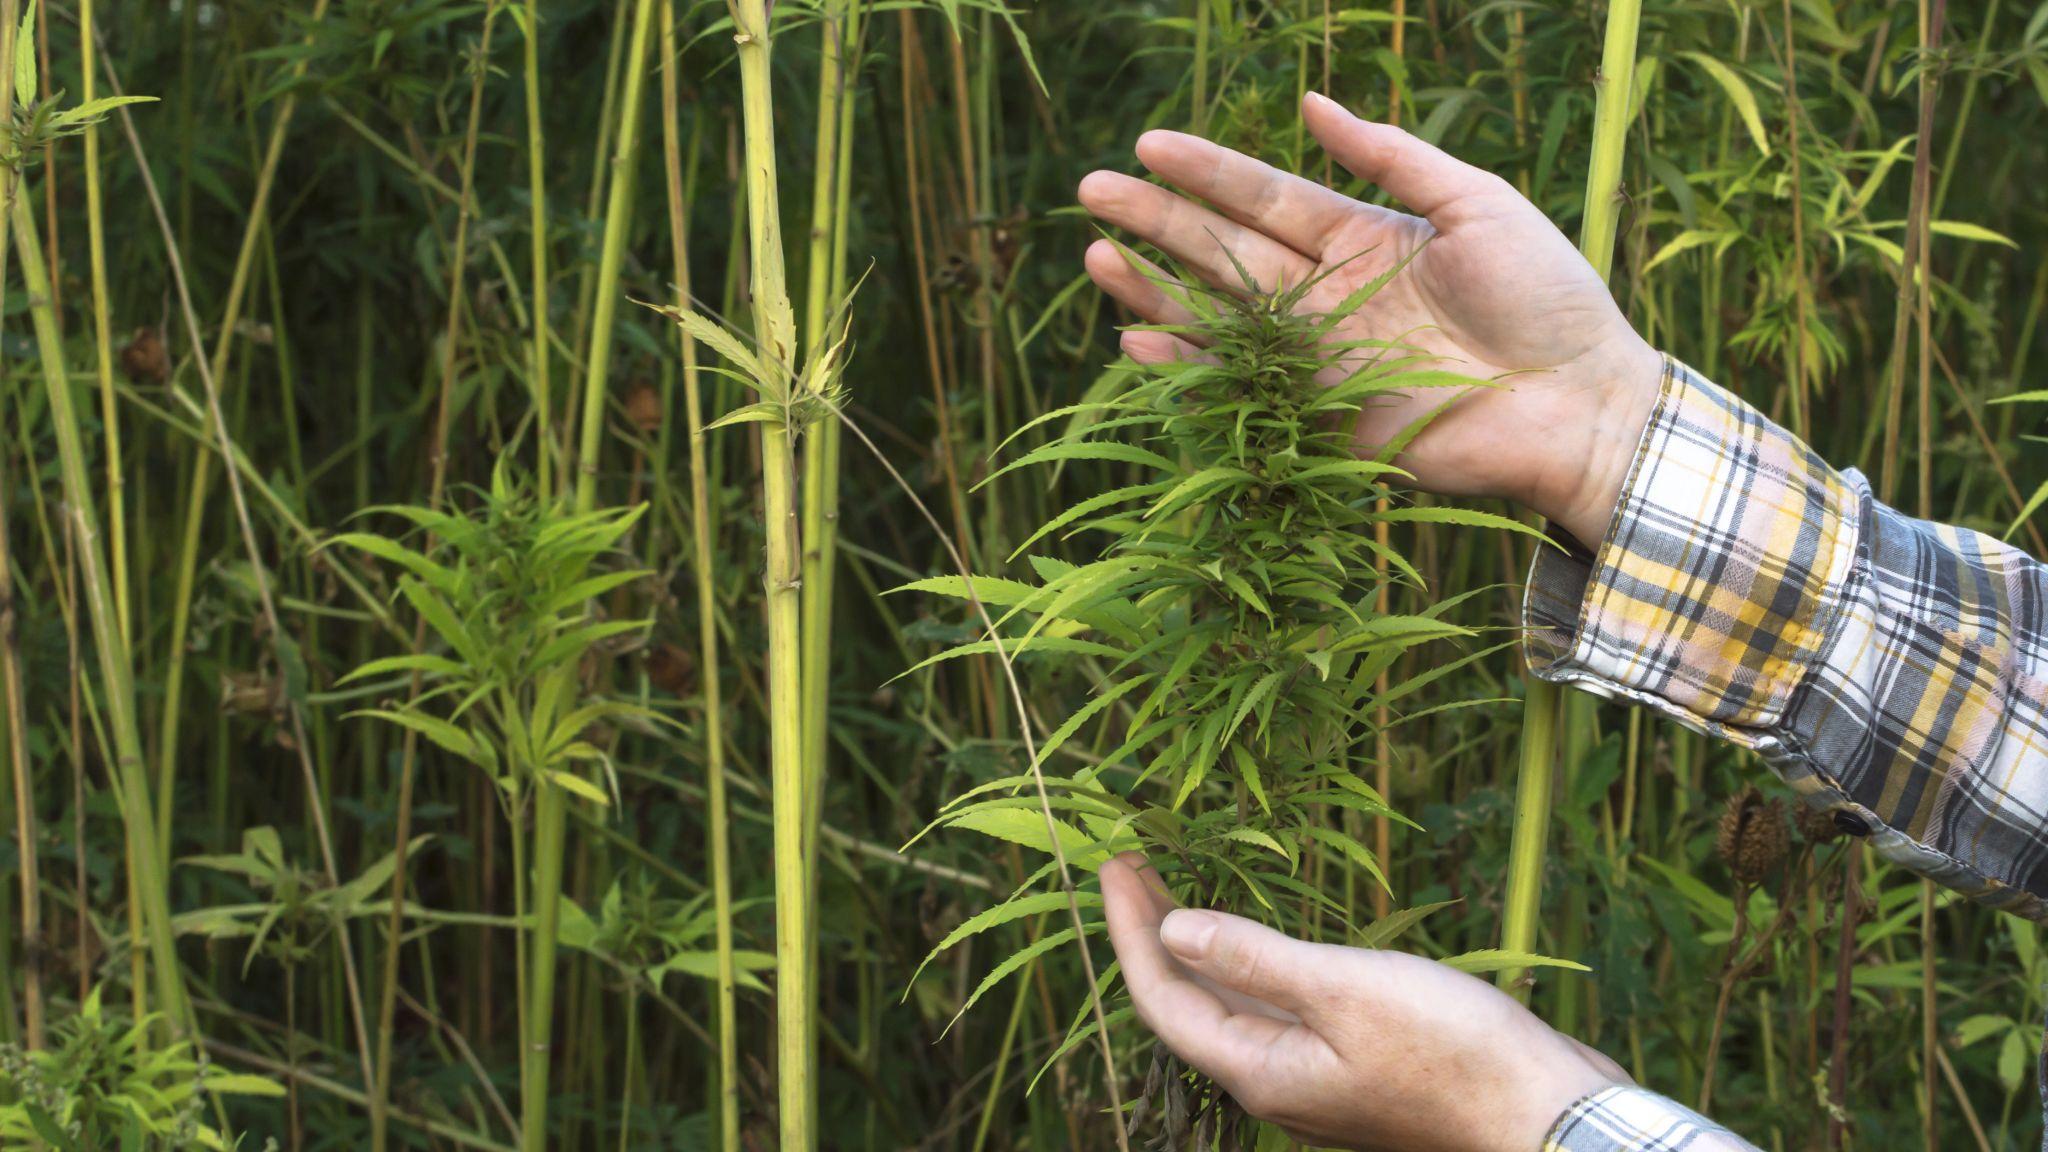 hands holding hemp plant